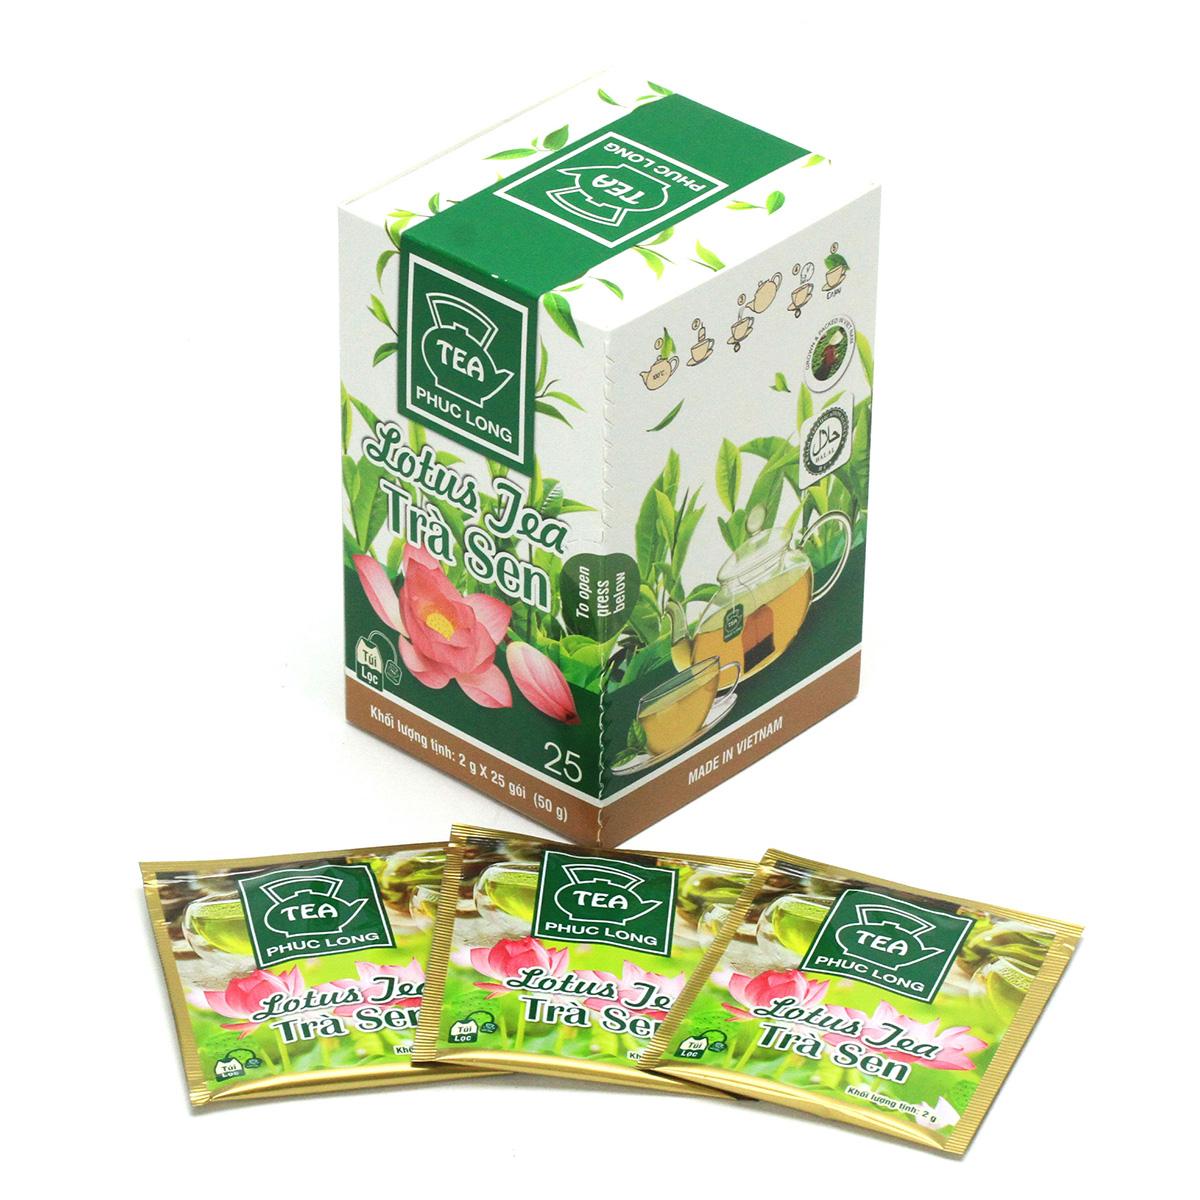 PhucLong ハス茶 ティーバッグ 25袋入(蓮花茶)ベトナム 蓮茶